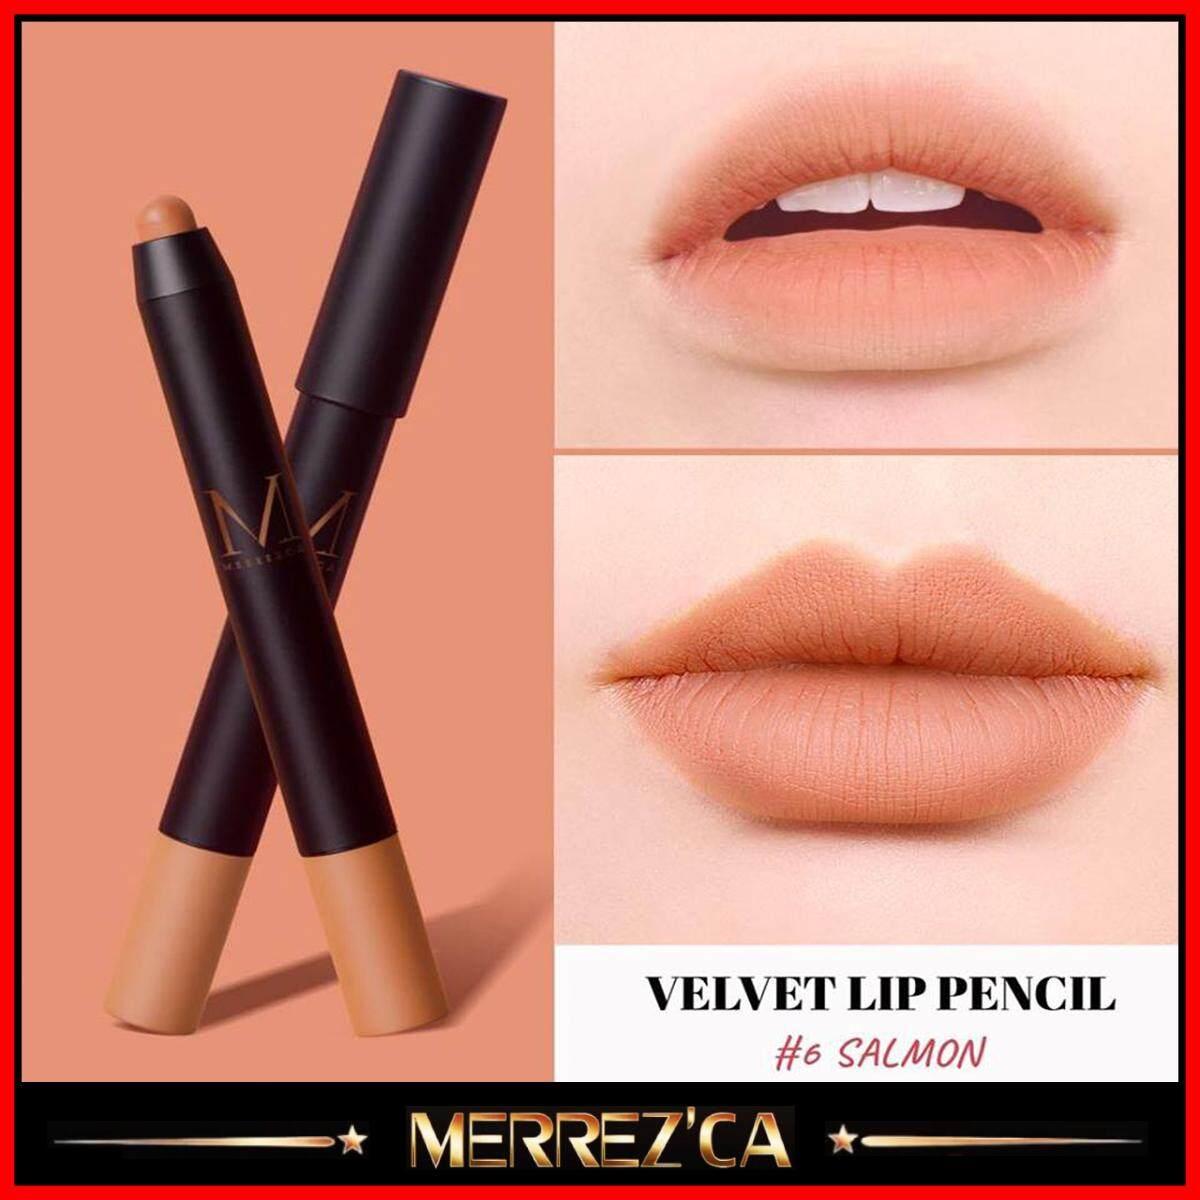 Merrezca Velvet Lip Pencil 1.3g เมอเรสก้า ลิปดินสอ กันน้ำ เนื้อแมท.